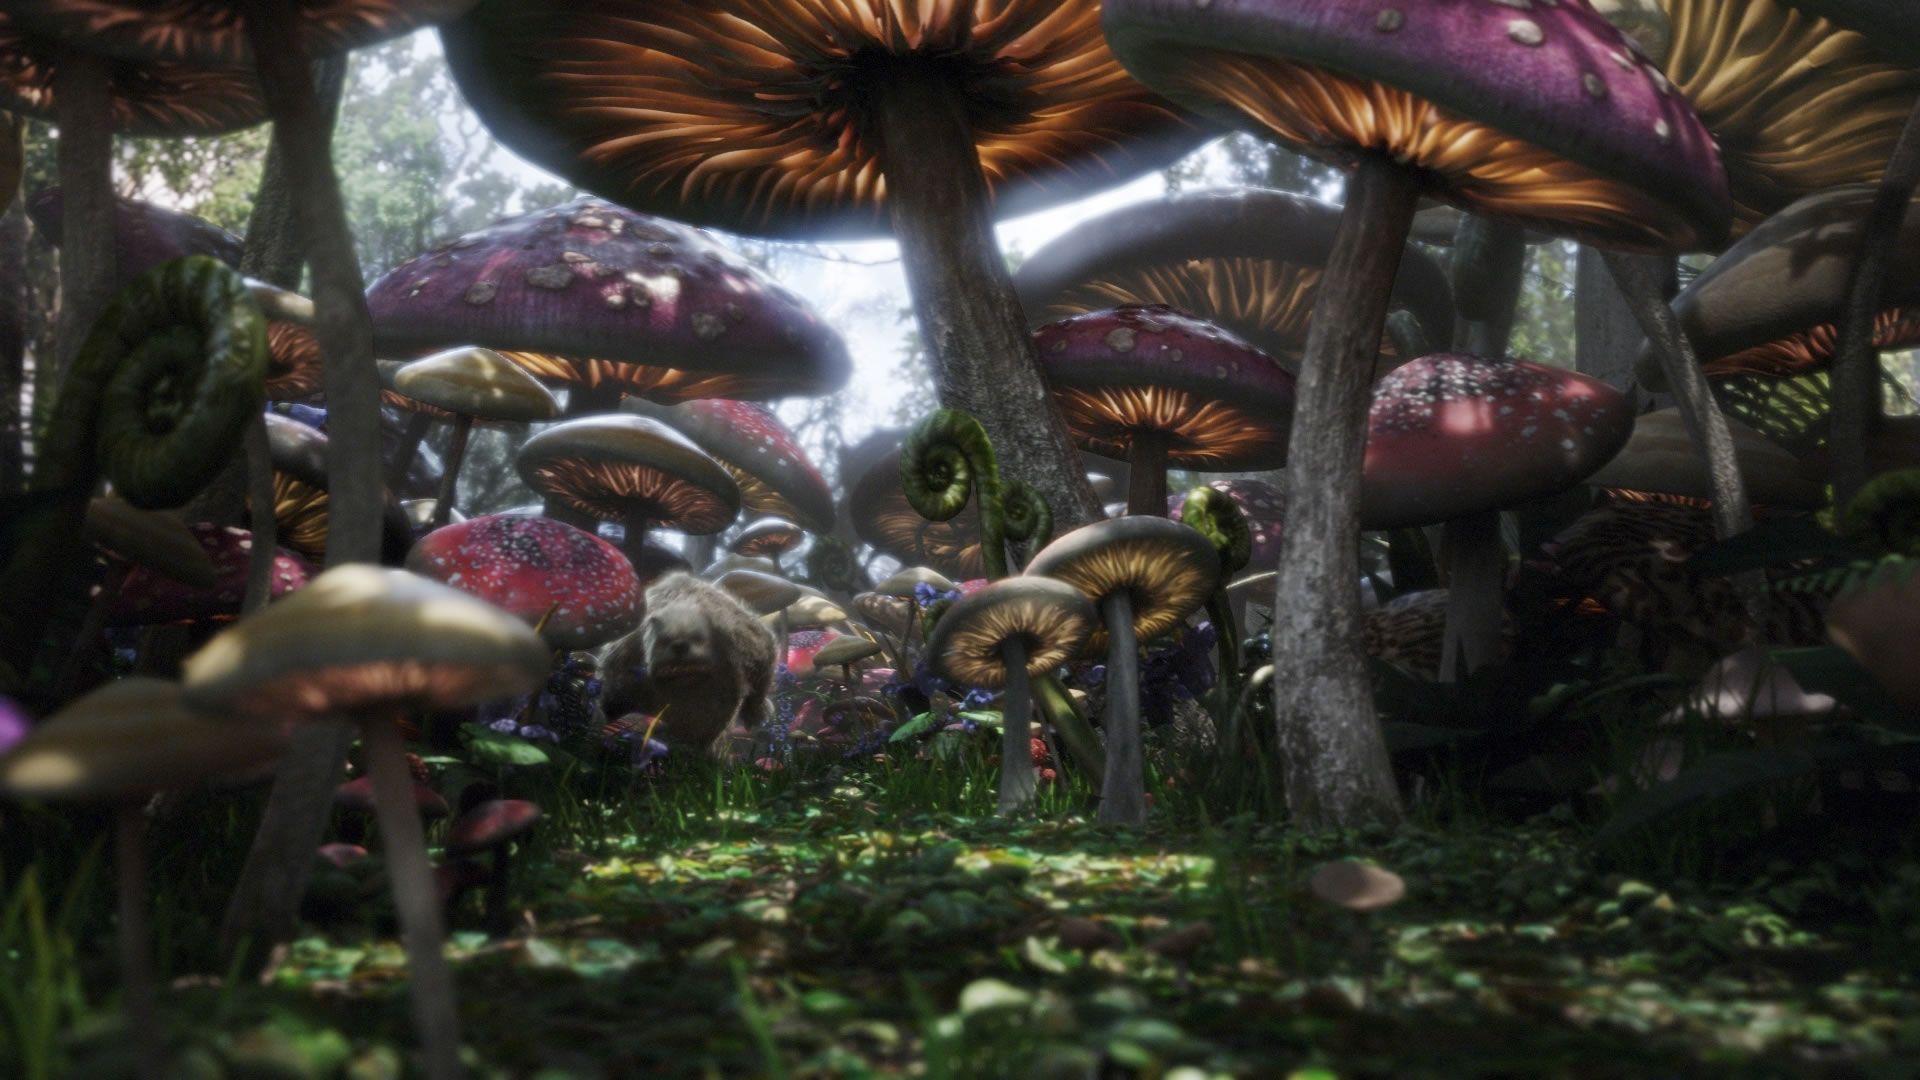 Alice In Wonderland Alice In Wonderland Movie Hd Wallpapers And